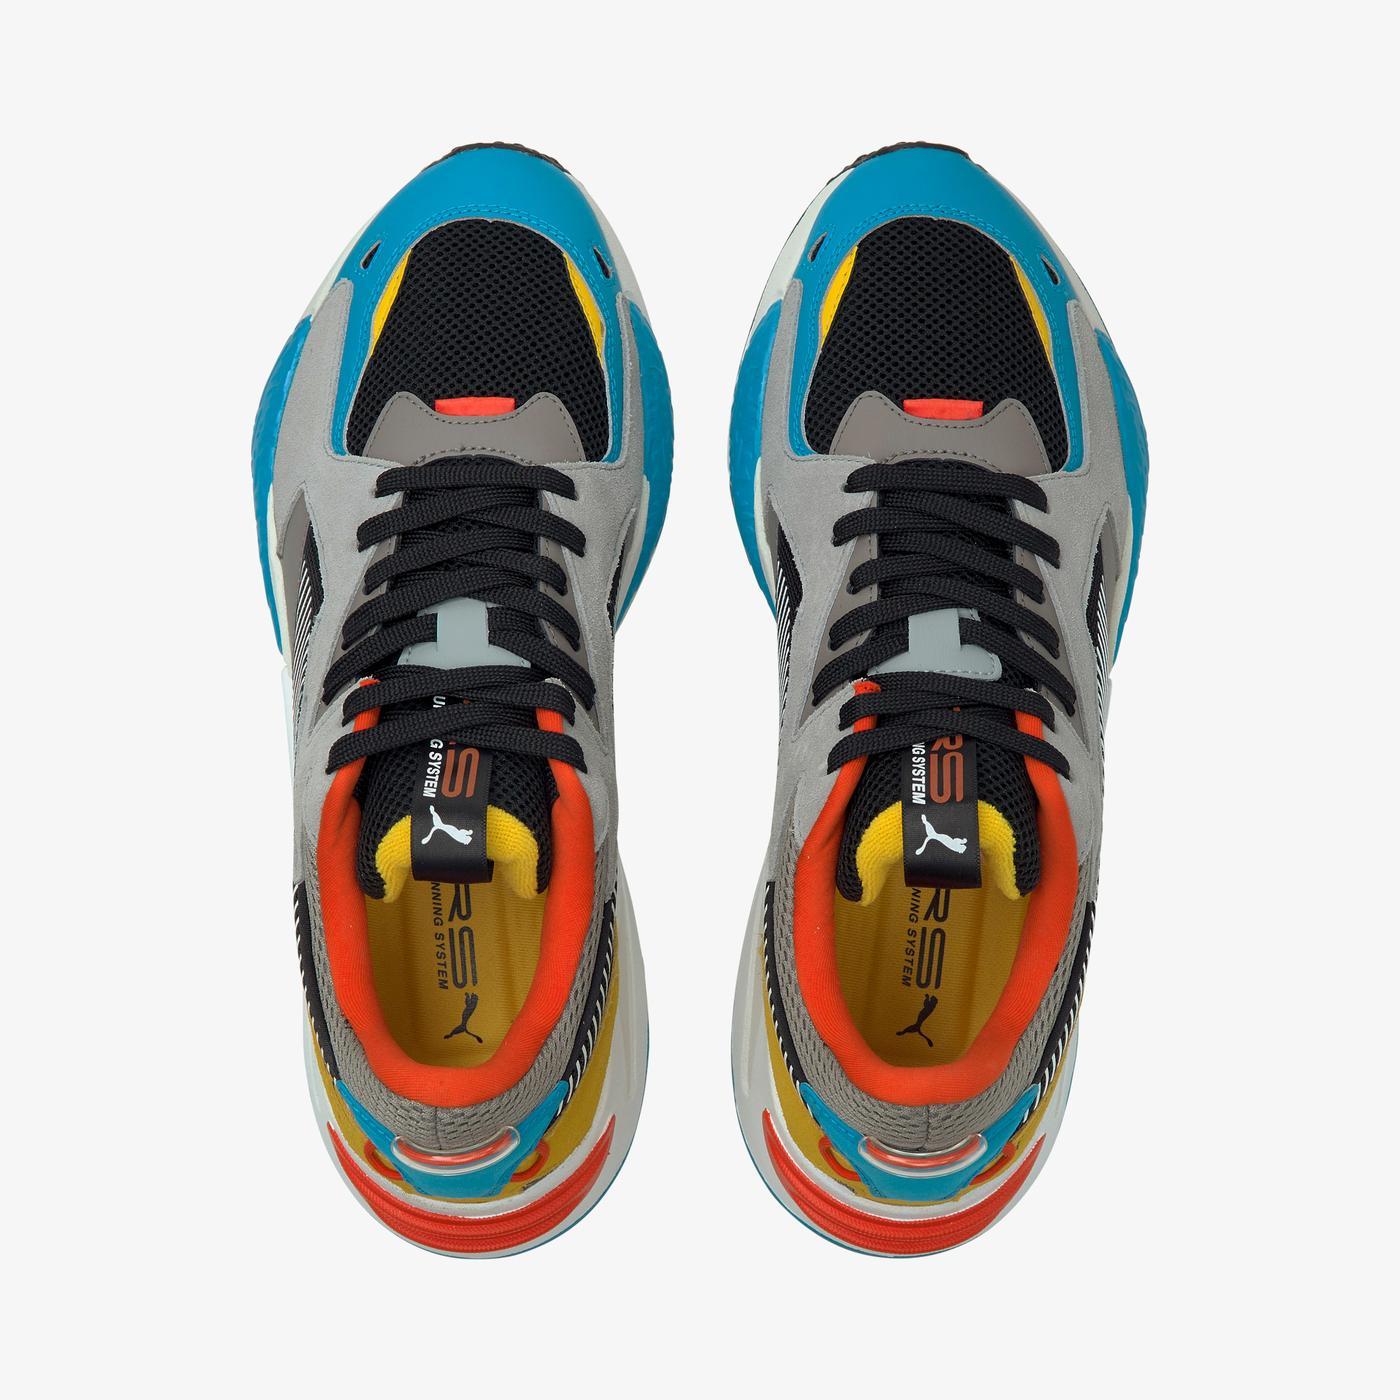 Puma RS-Z Erkek Renkli Spor Ayakkabı